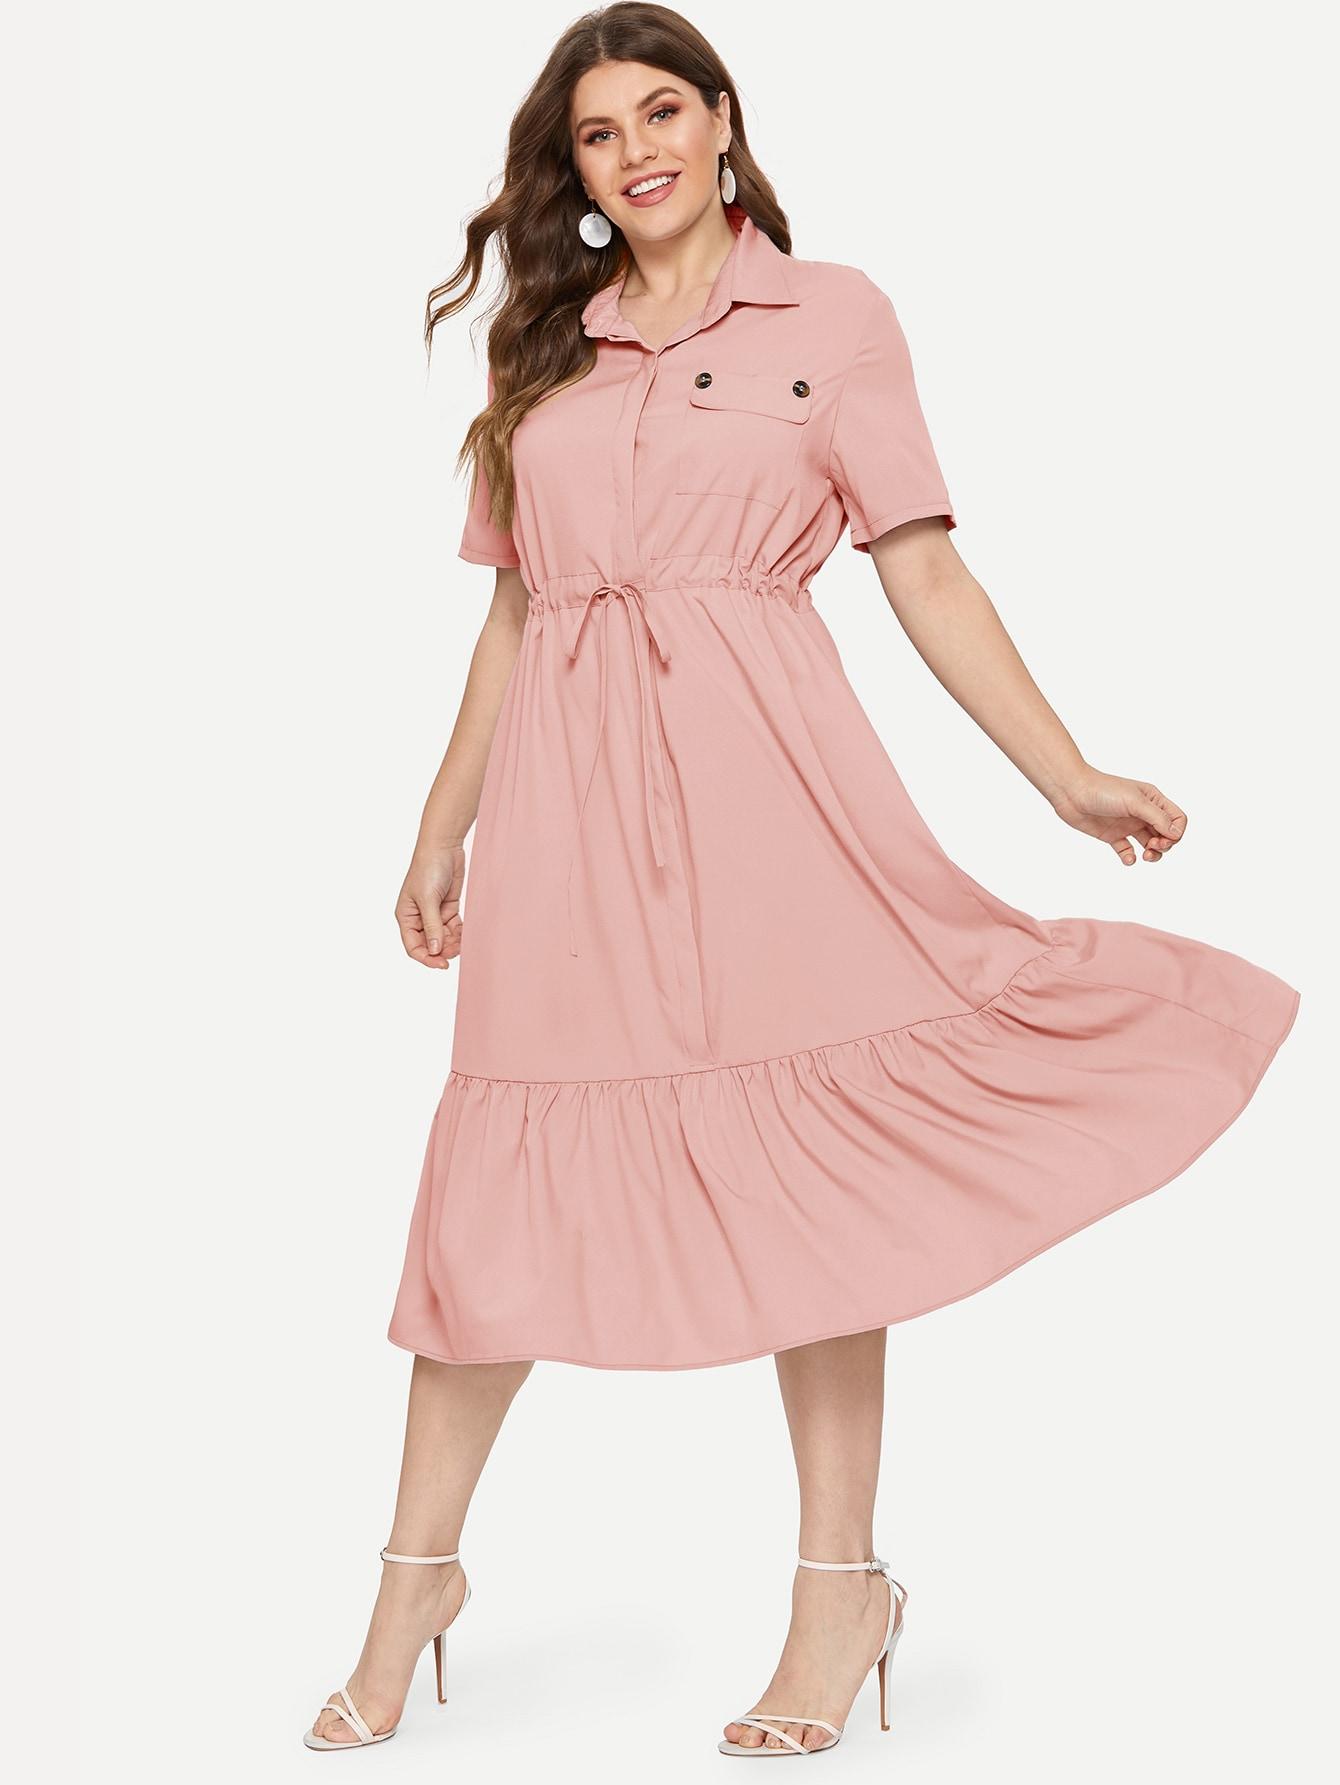 Размер плюс платье на кулиске с оборками